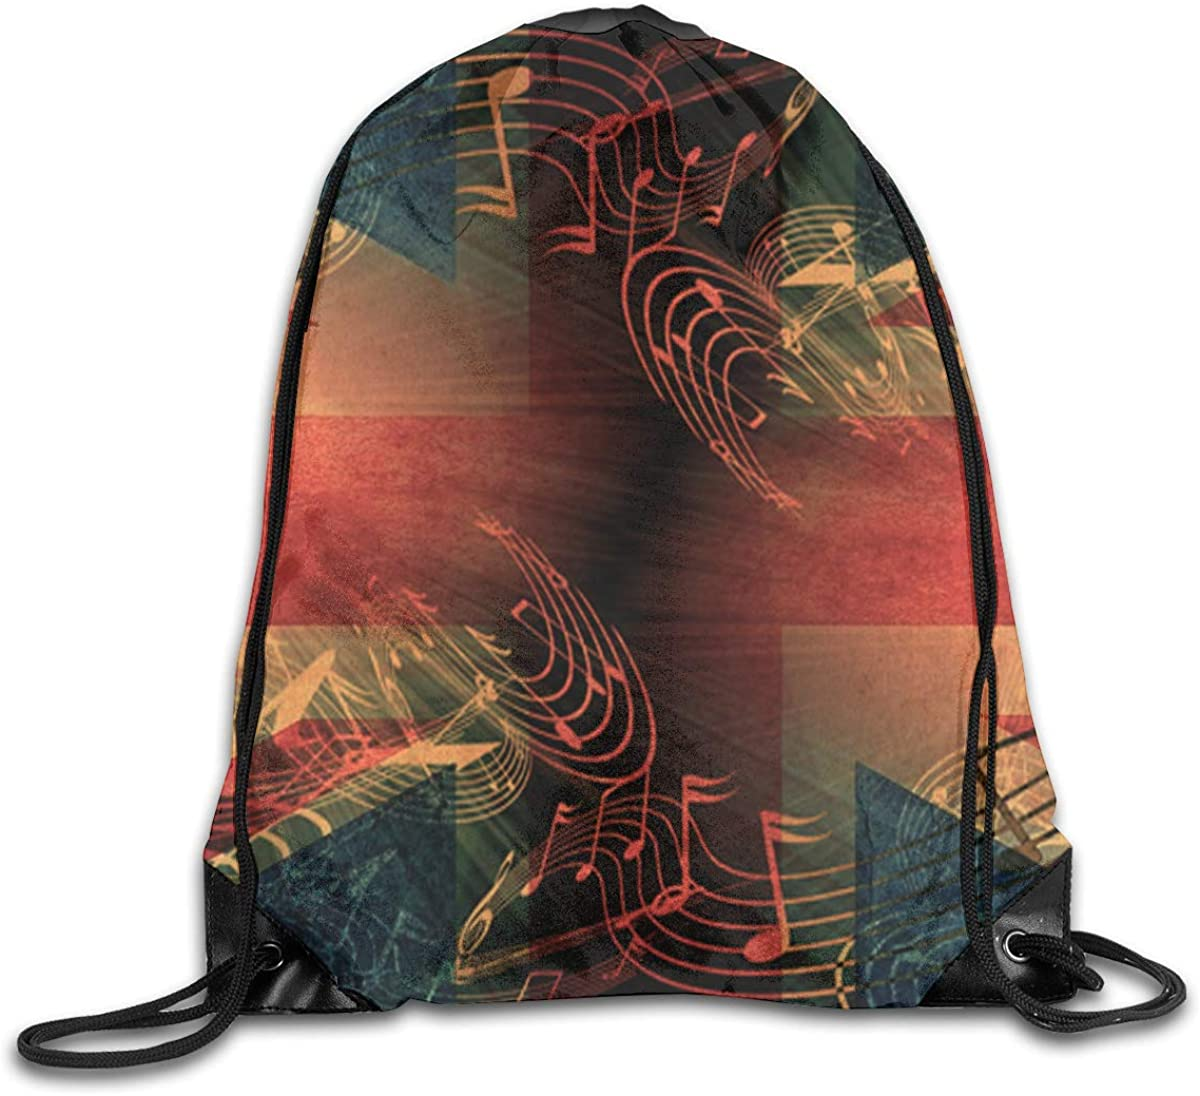 UK Flag Beam Mouth Backpack Pull Rope Shoulder Bag Outdoor Sports Leisure Bag